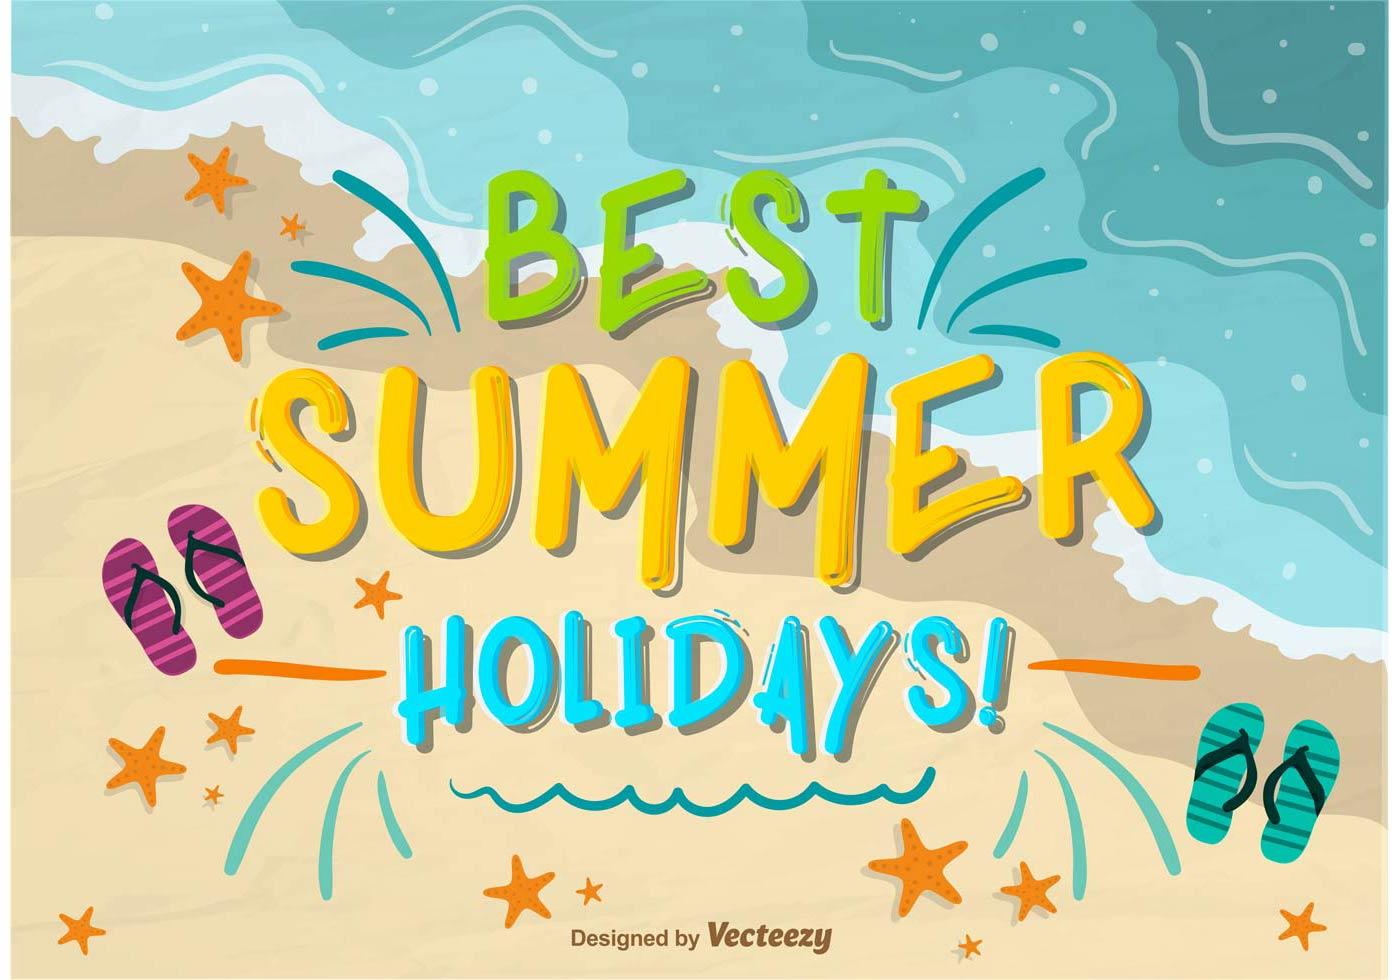 Best Summer Holidays Wallpaper - Download Free Vector Art, Stock ...